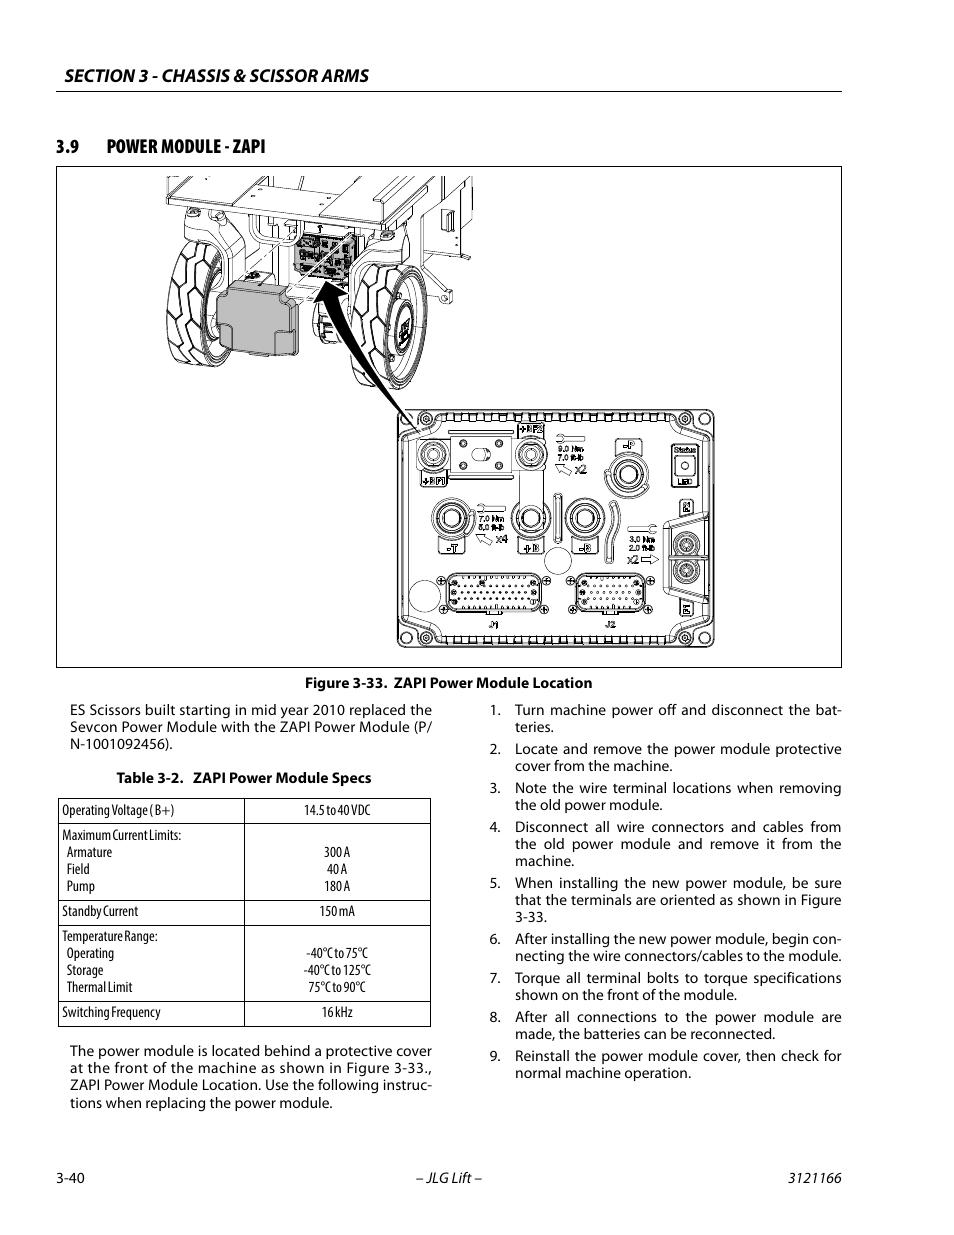 Diagram 70 Wiring Diagram 71 Wiring Diagram 72 Wiring Diagram 65 66